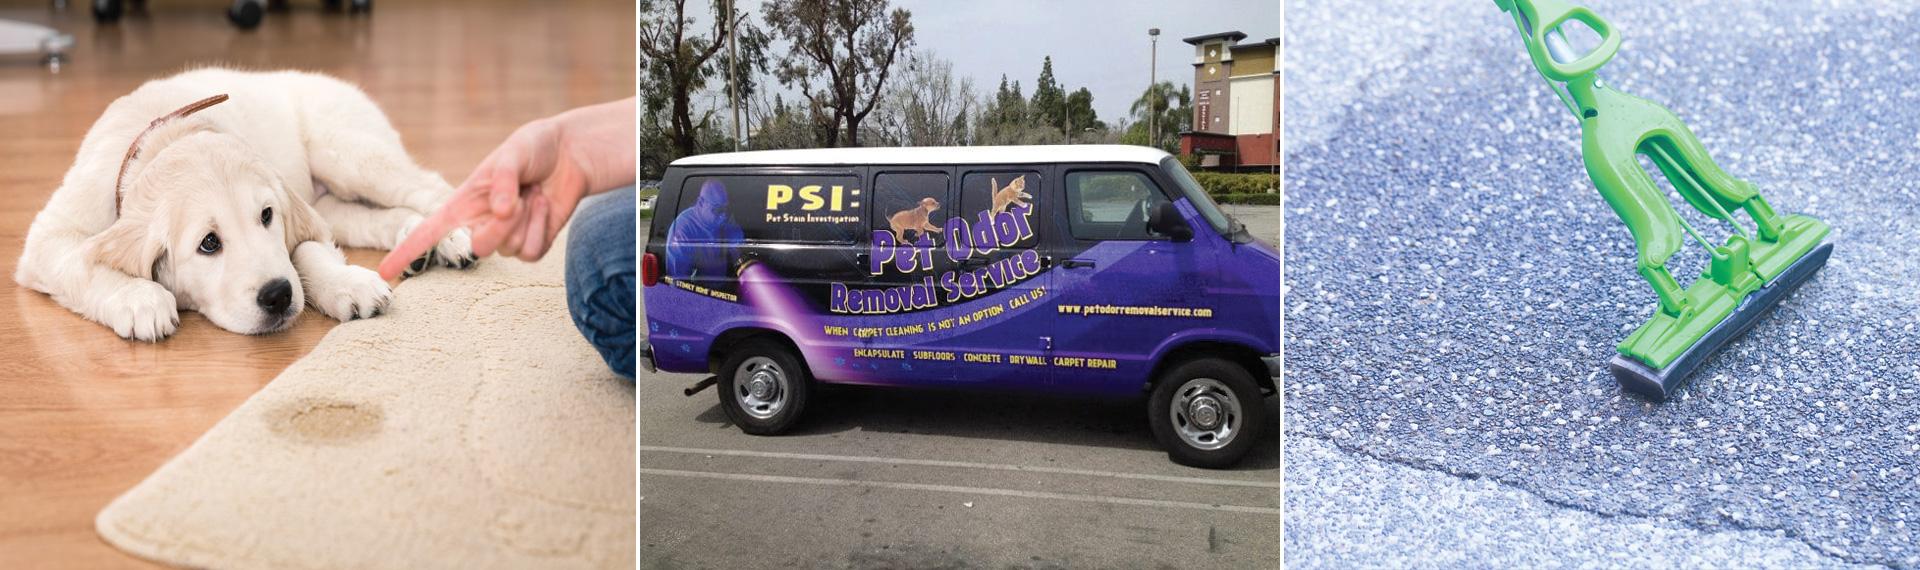 Pet Odor Removal Service Laguna Beach CA